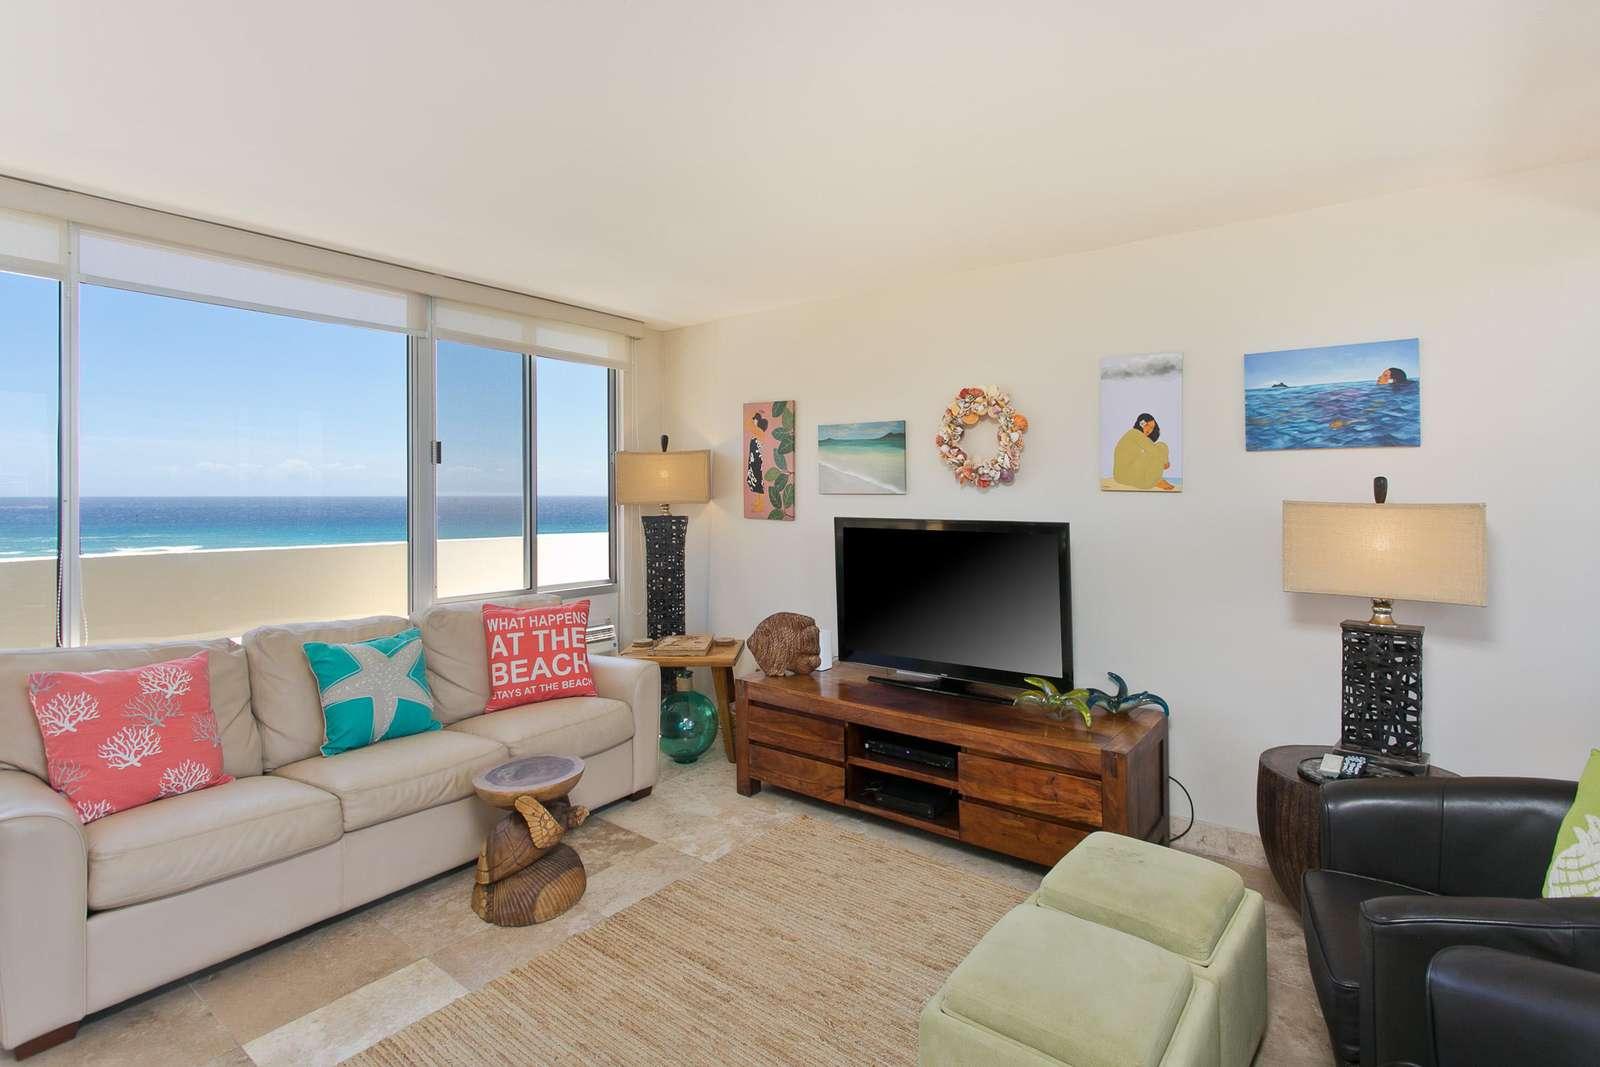 Comfortable ocean themed furnishings